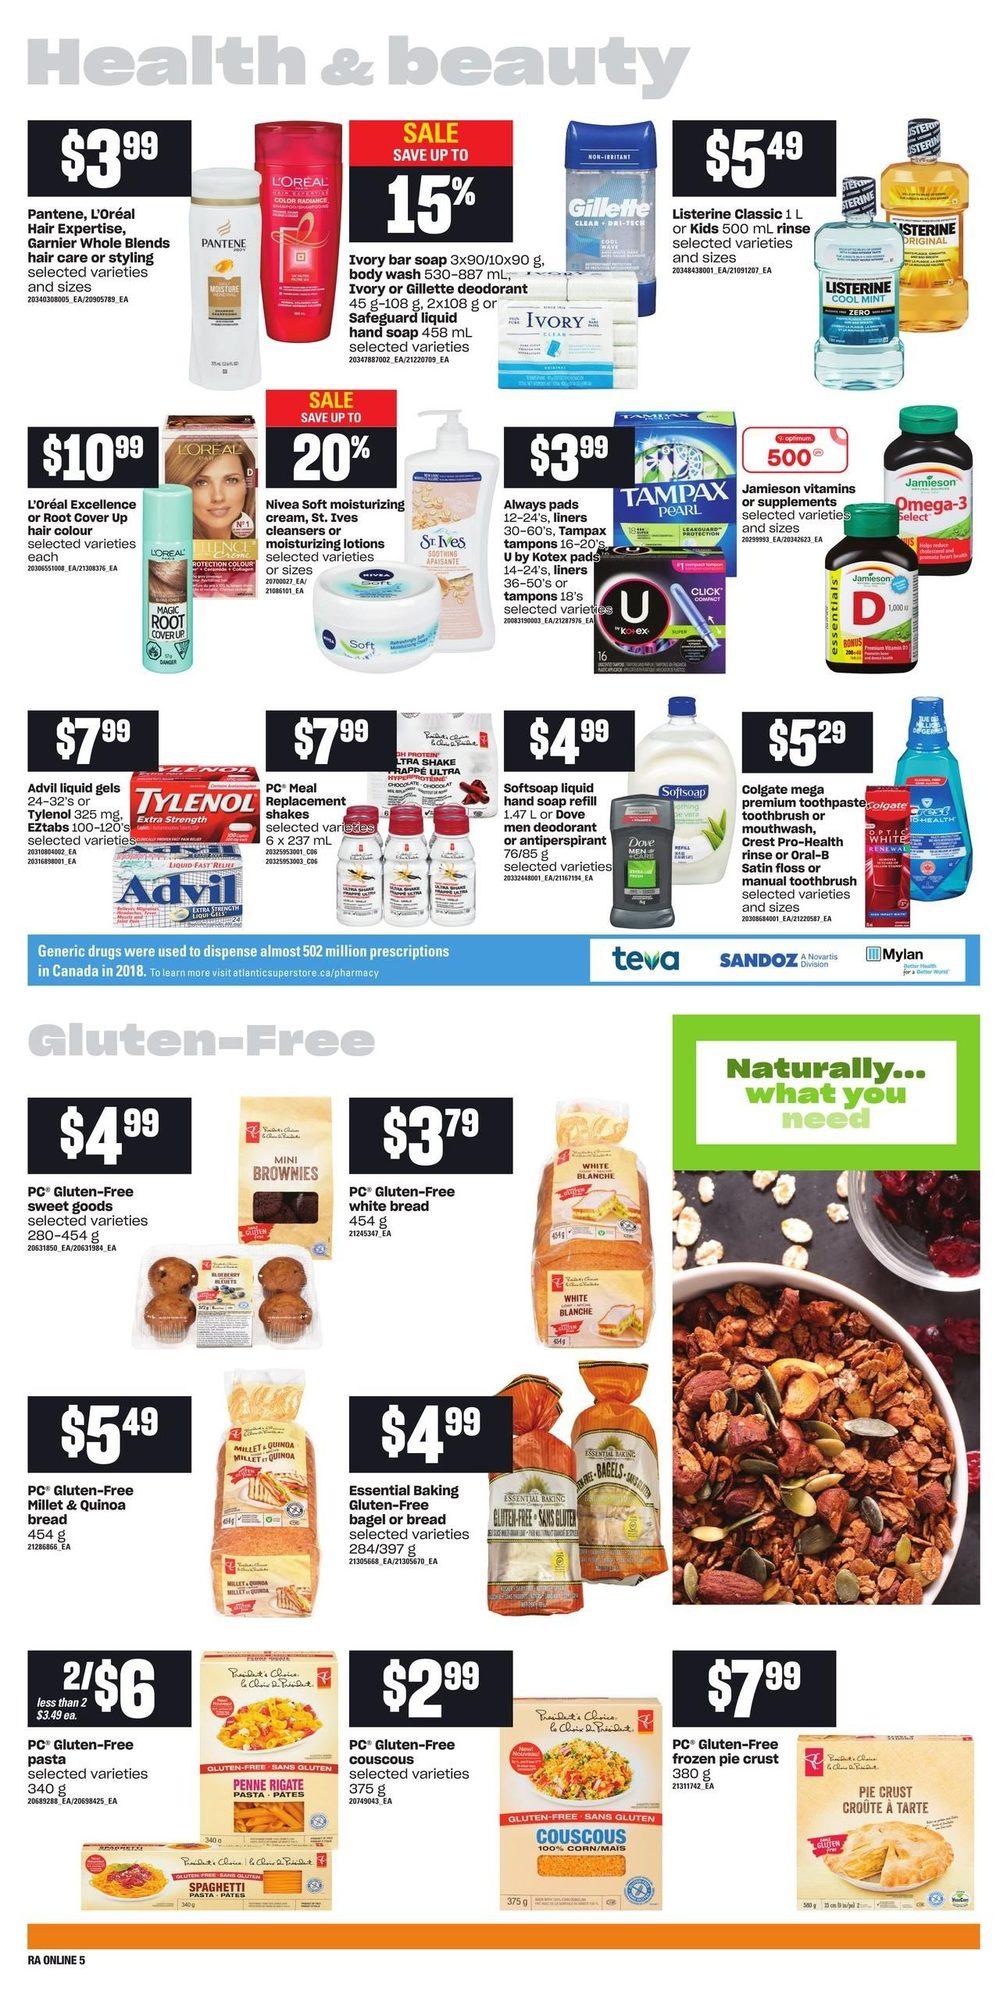 Atlantic Superstore - Weekly Flyer Specials - Page 9